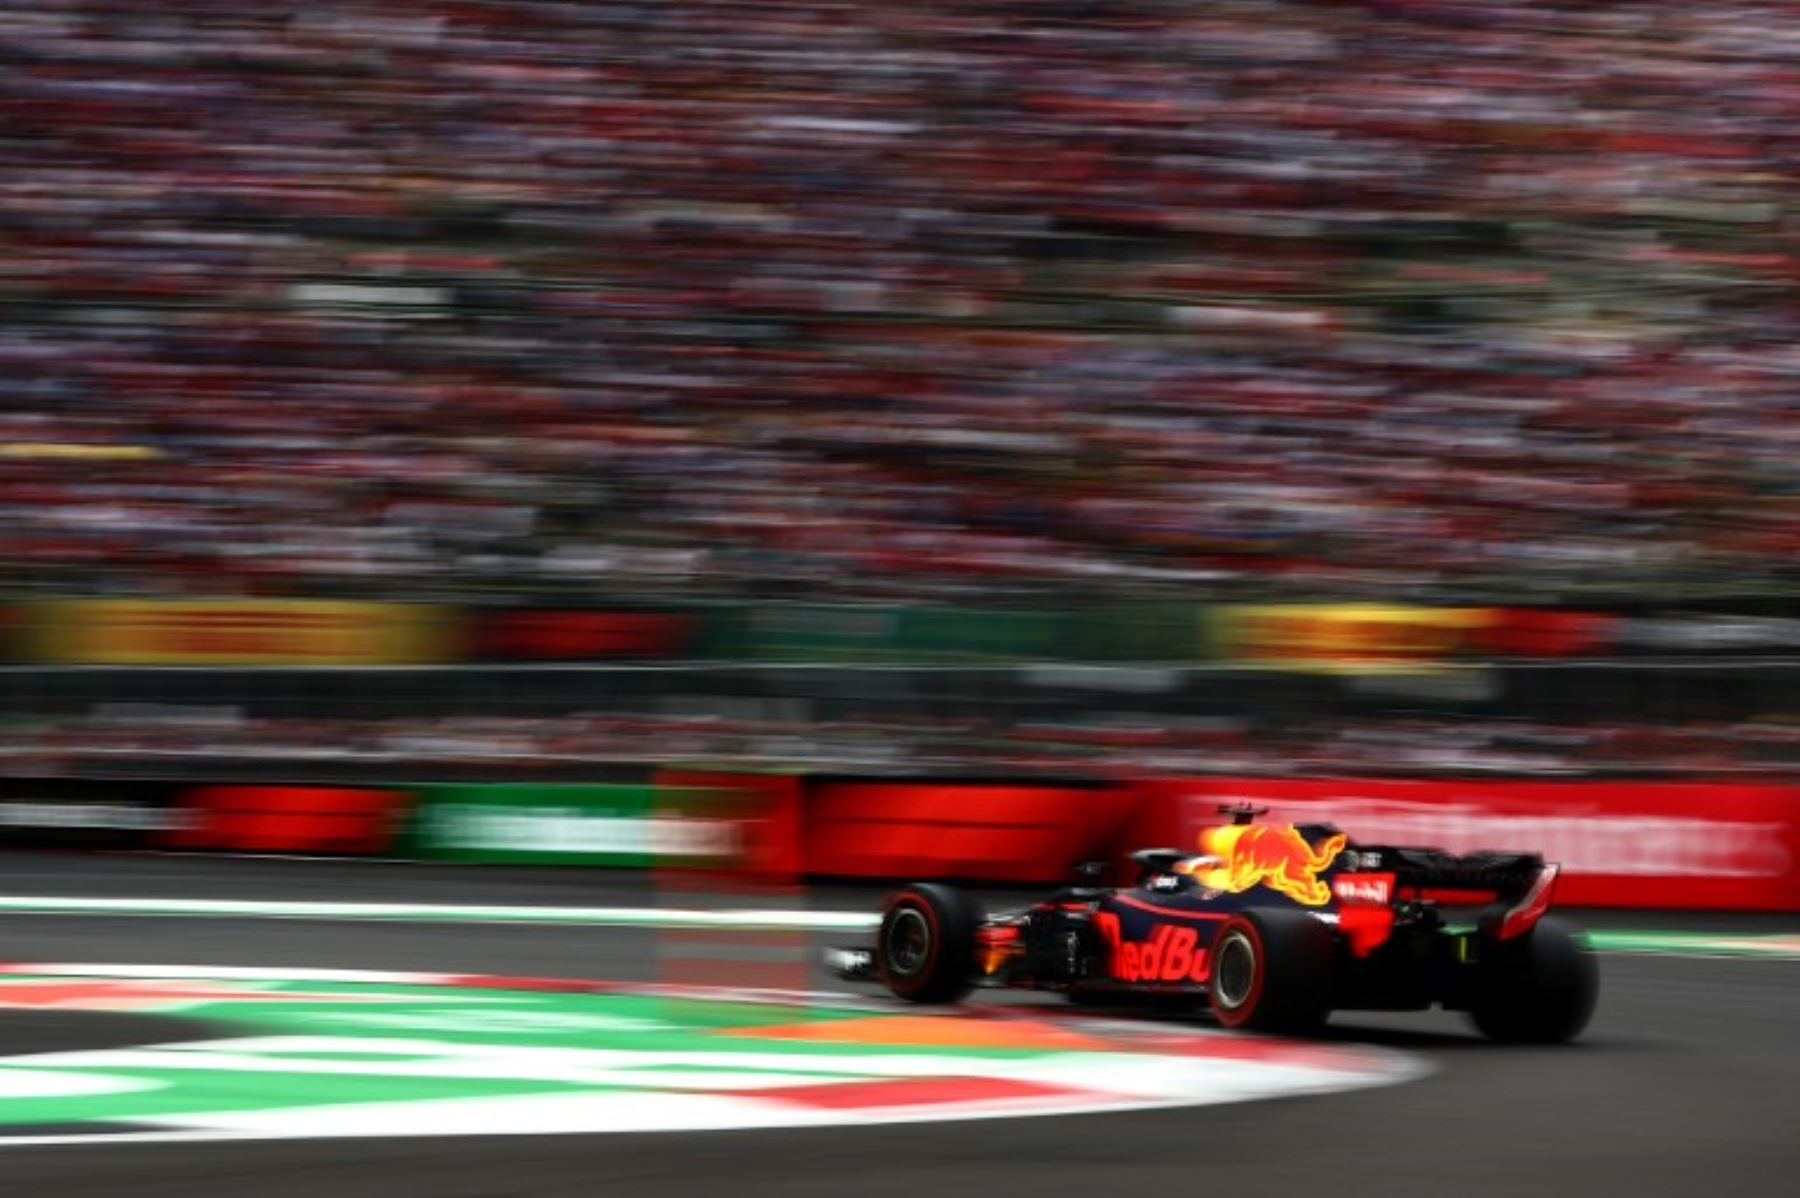 Calendario De Formula 1 2019.De Australia A Abu Dabi El Calendario De La Formula 1 En